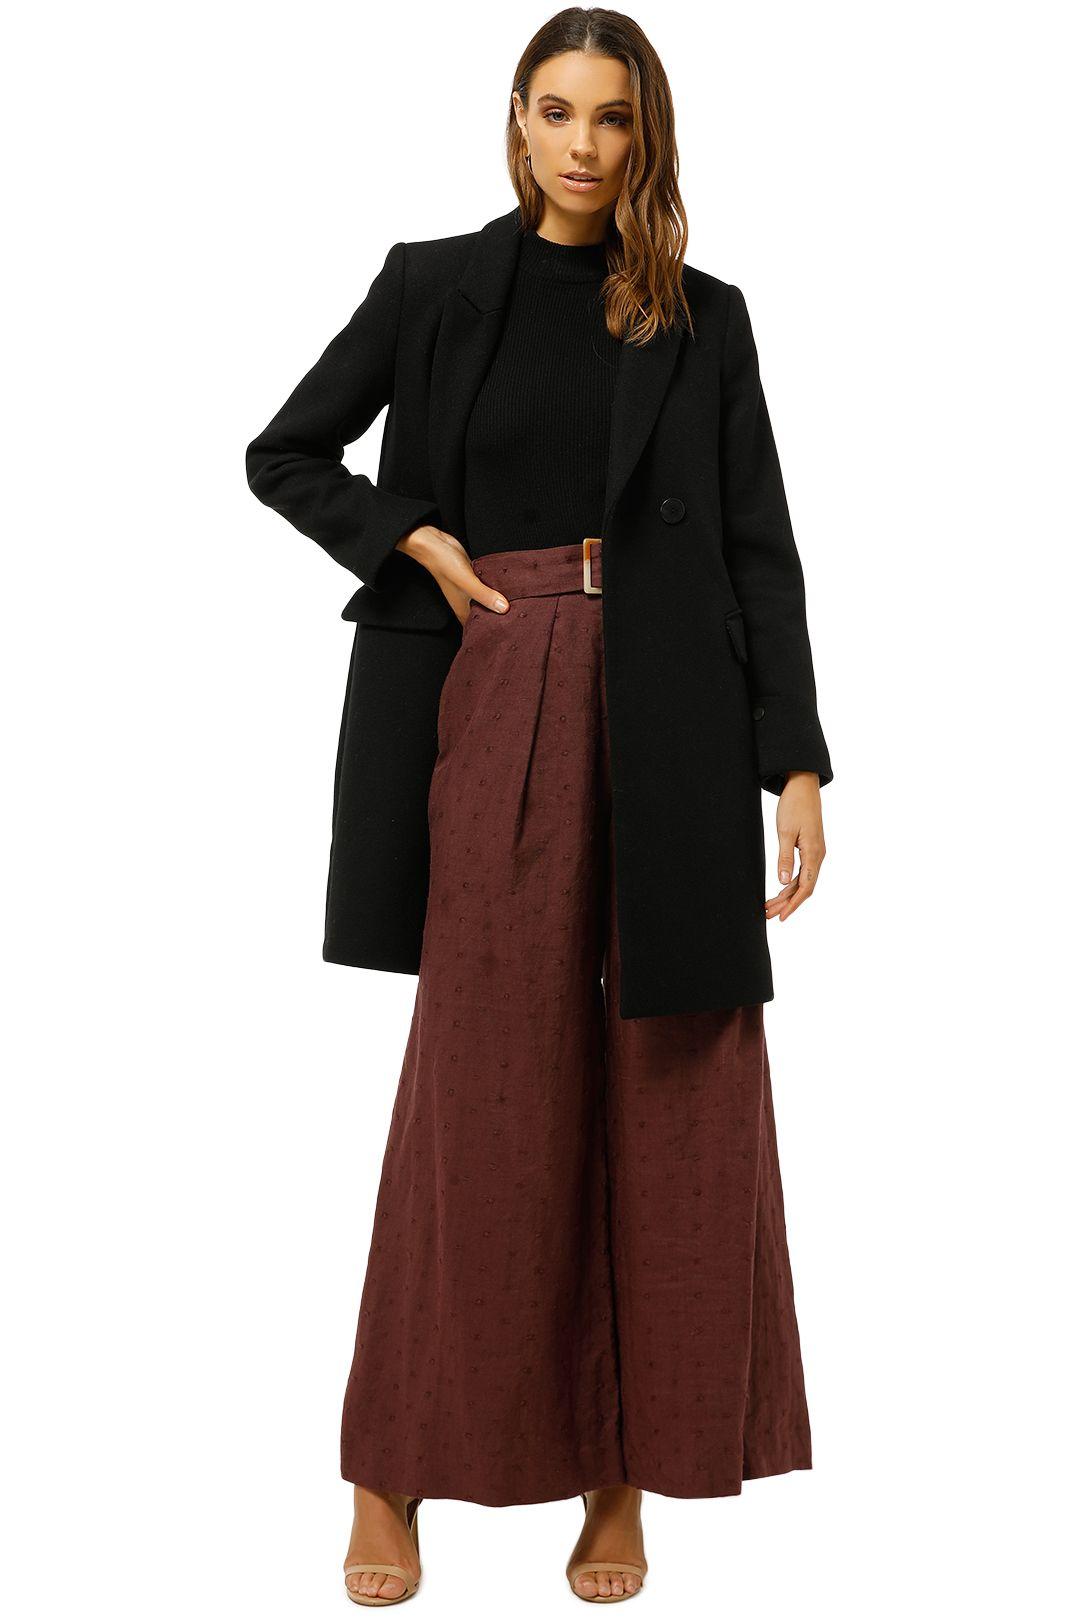 MNG-Masculine-Structured-Coat-Black-Front